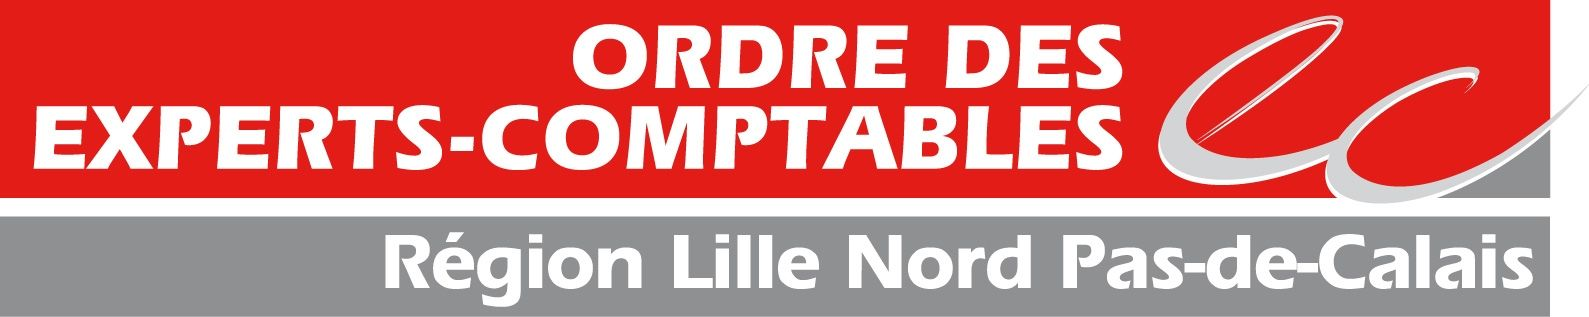 ORDRE DES EXPERTS COMPTABLES NPDC